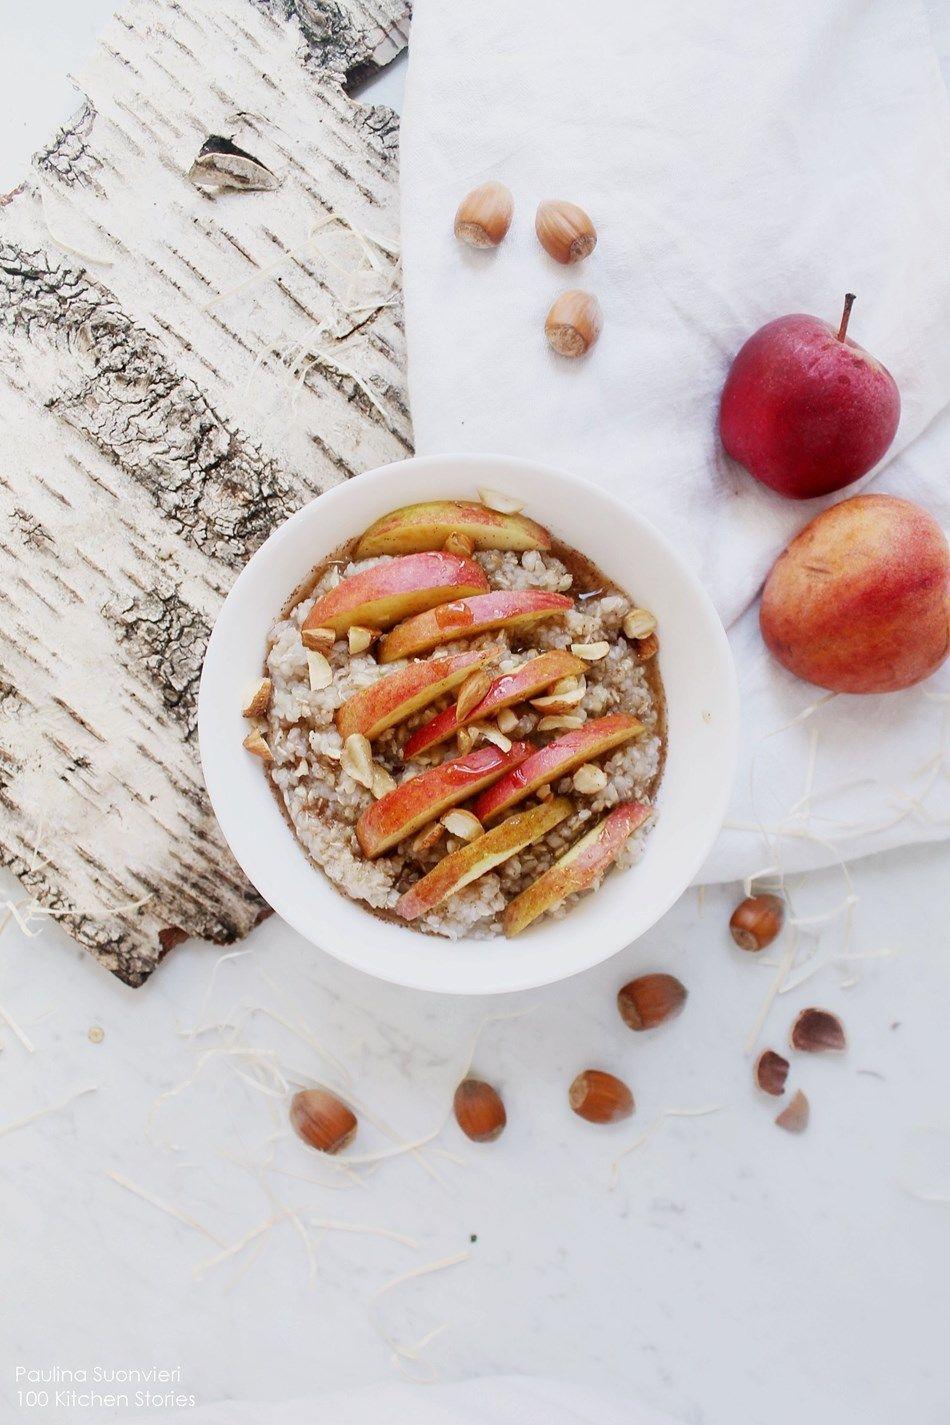 100 KITCHEN STORIES: Buckwheat Porridge with Apple, Cinnamon Swirl ...